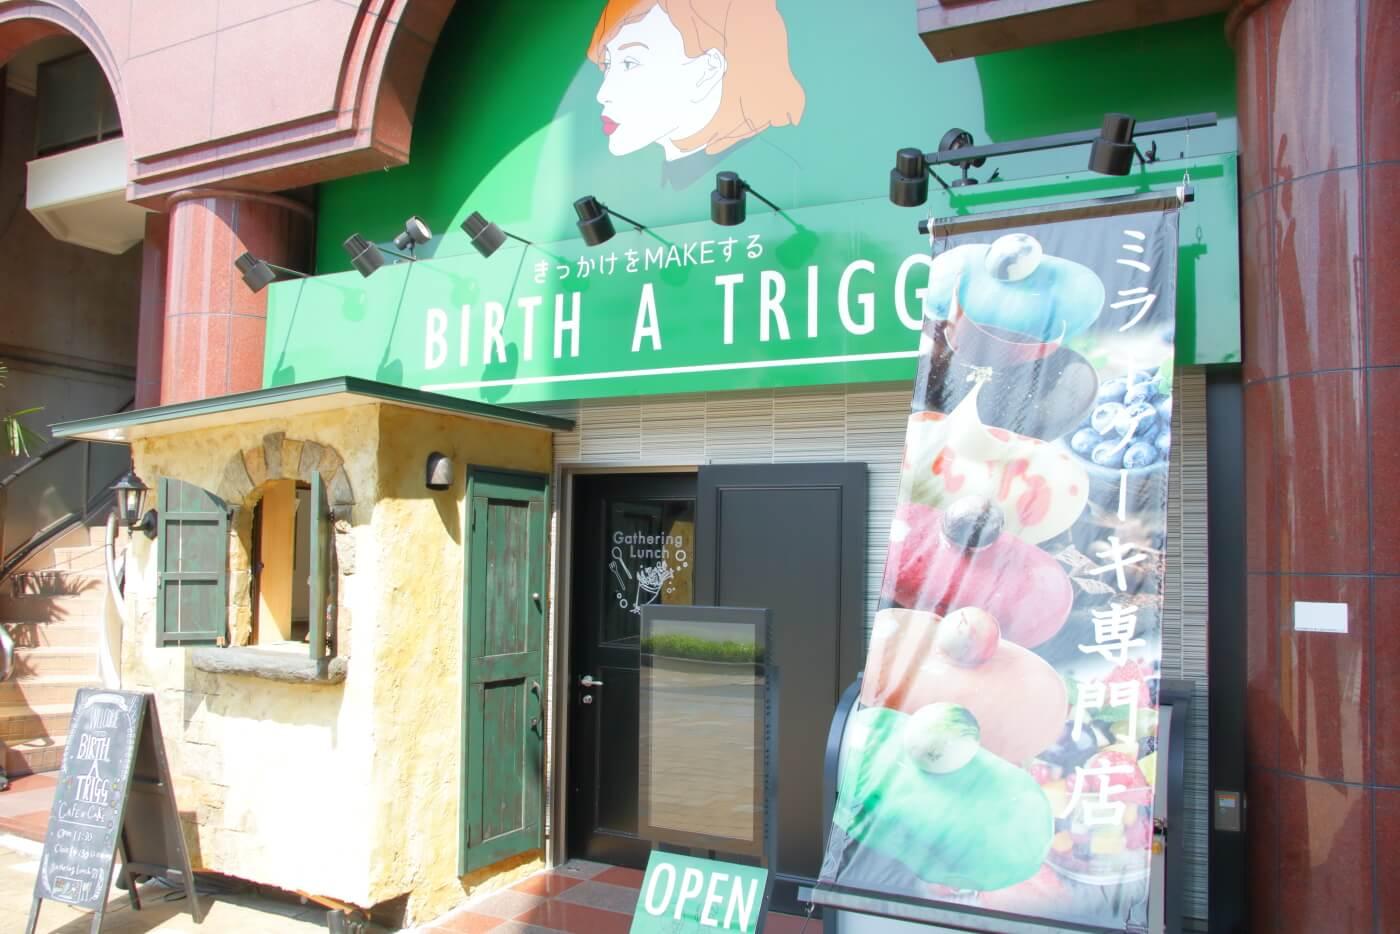 birth a trigg cafe(バースアトリッグカフェ)外観